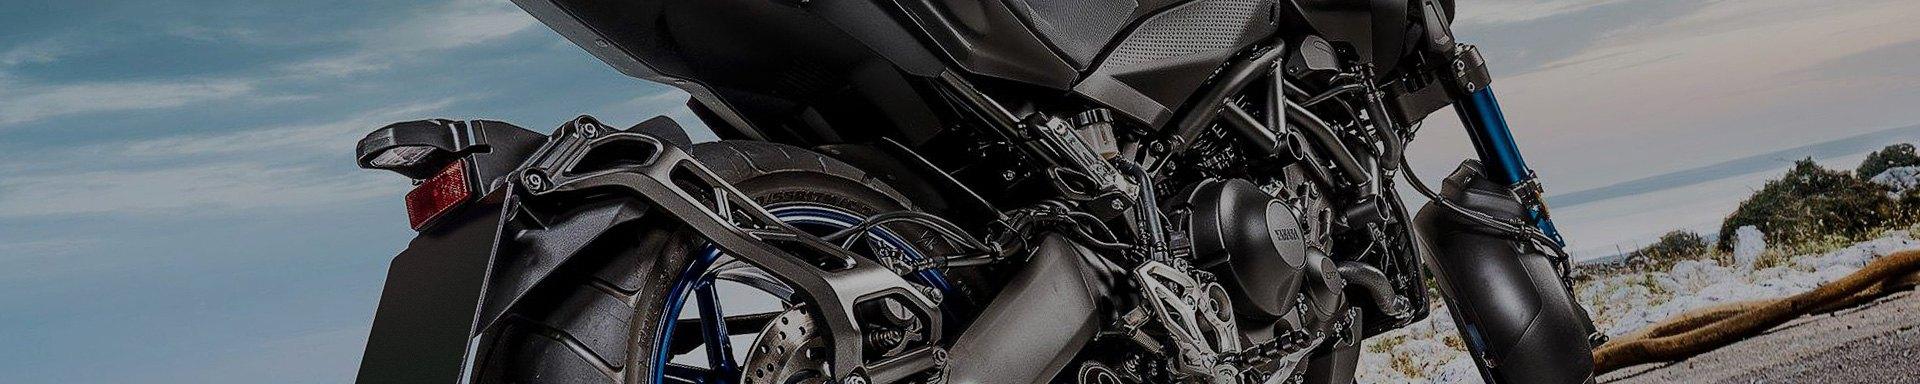 de14f392fd4 Motorcycle Parts & Accessories   Sport Bike, Cruiser, Dirt Bike ...